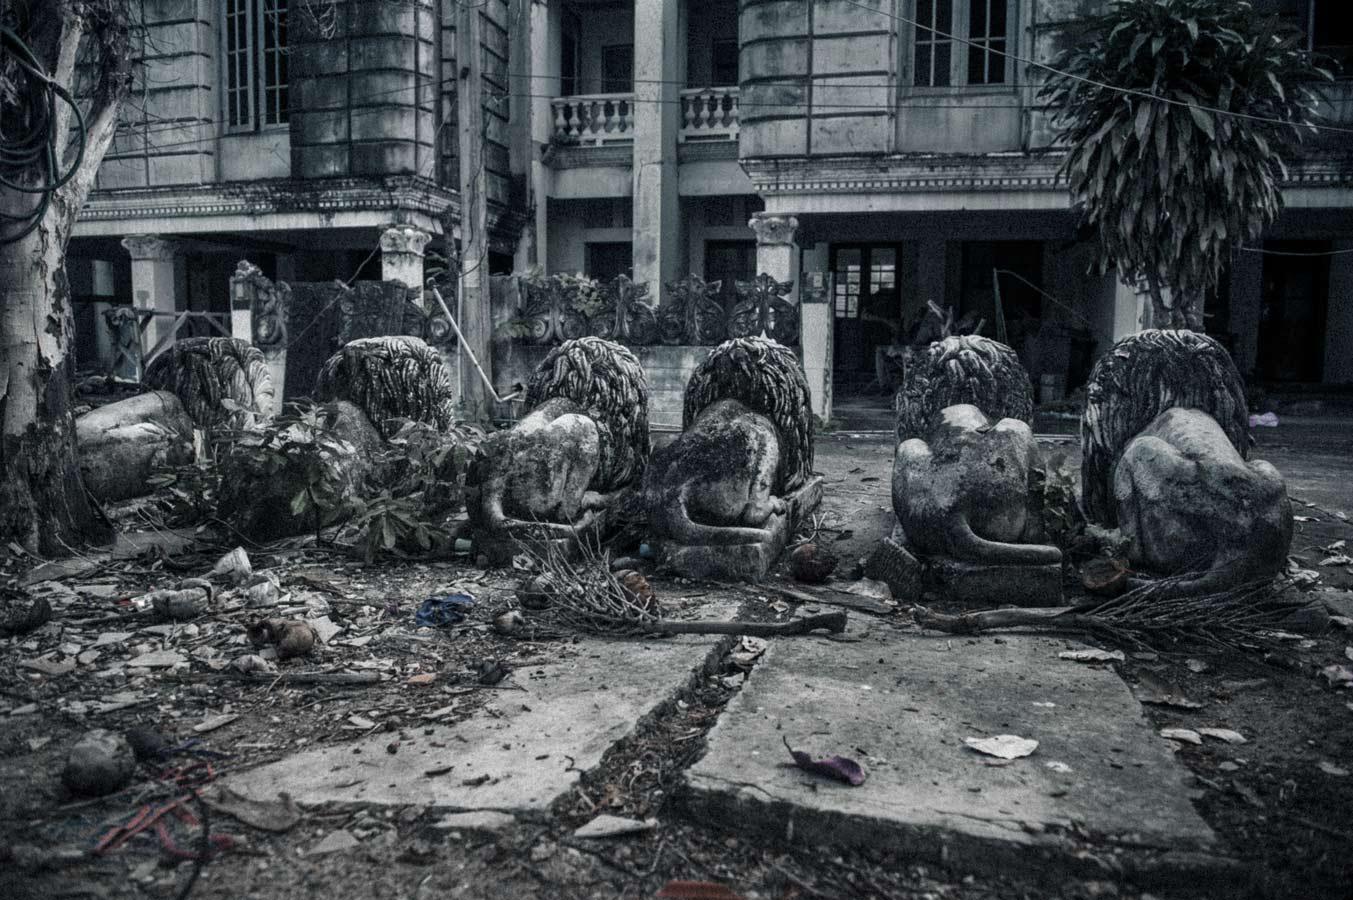 Jamie-Lowe-Photography-Haunted-House-Chiang-Mai-24.jpg